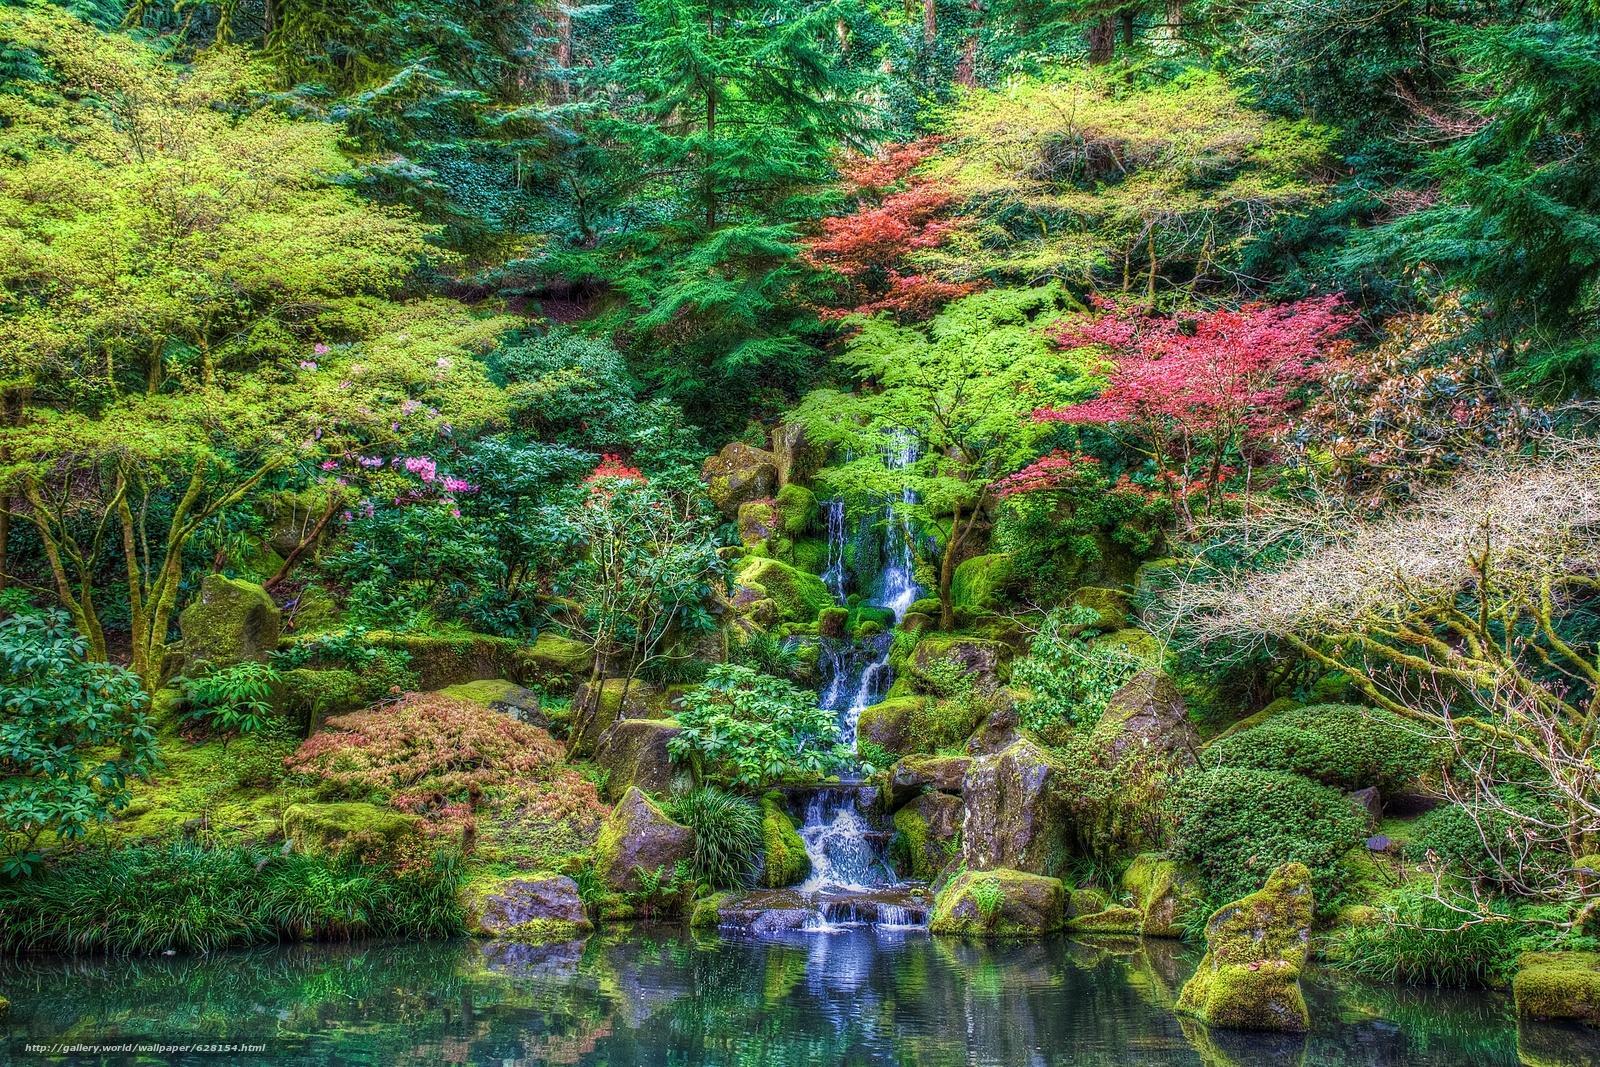 Tlcharger fond d 39 ecran jardin japonais jardin japonais for Jardin japonais fond d ecran